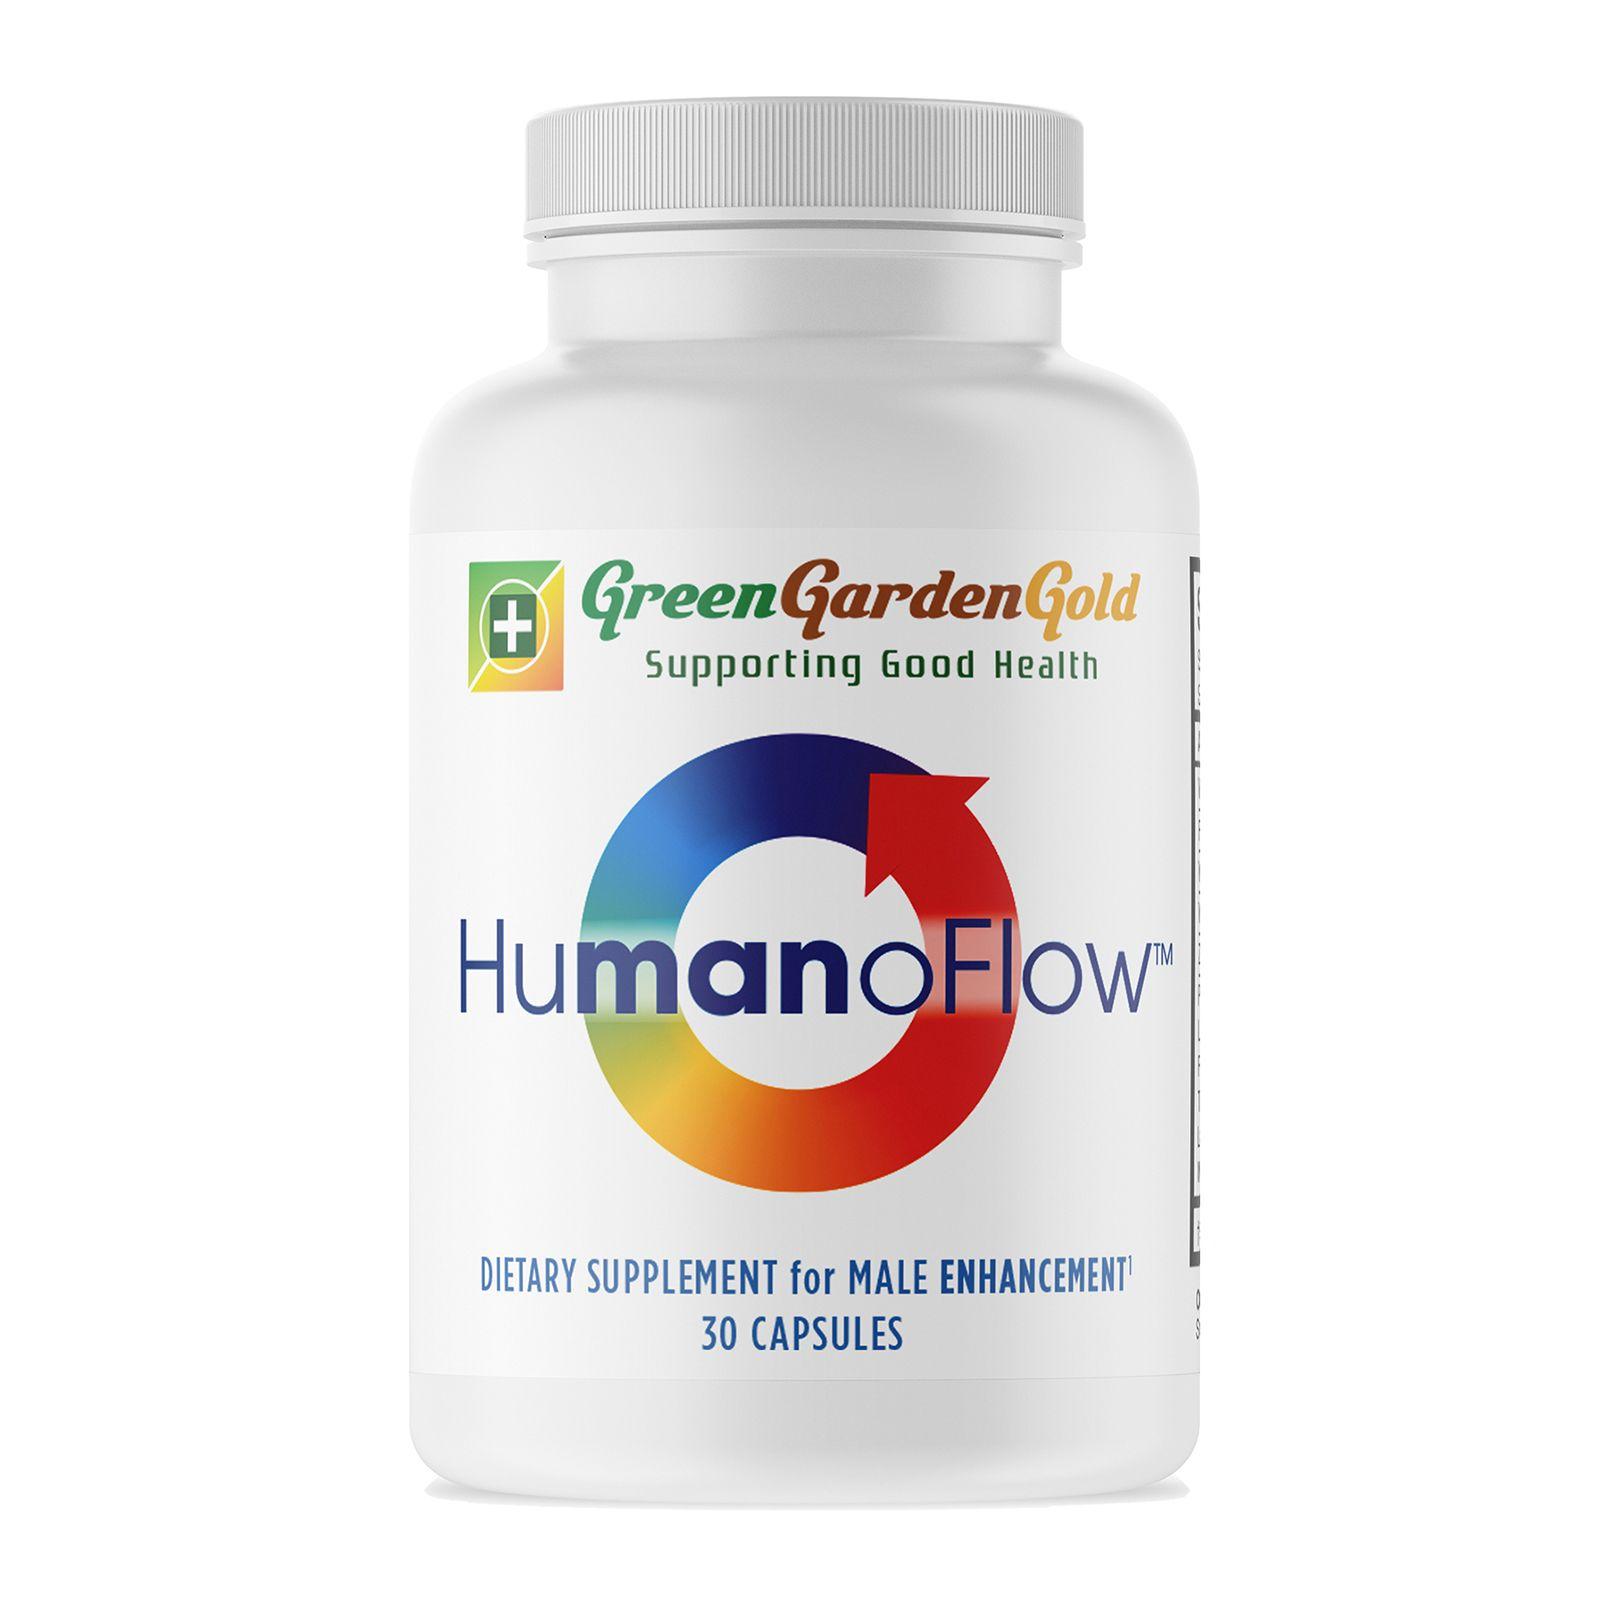 HumanoFlow Male Enhancement 30 Capsules